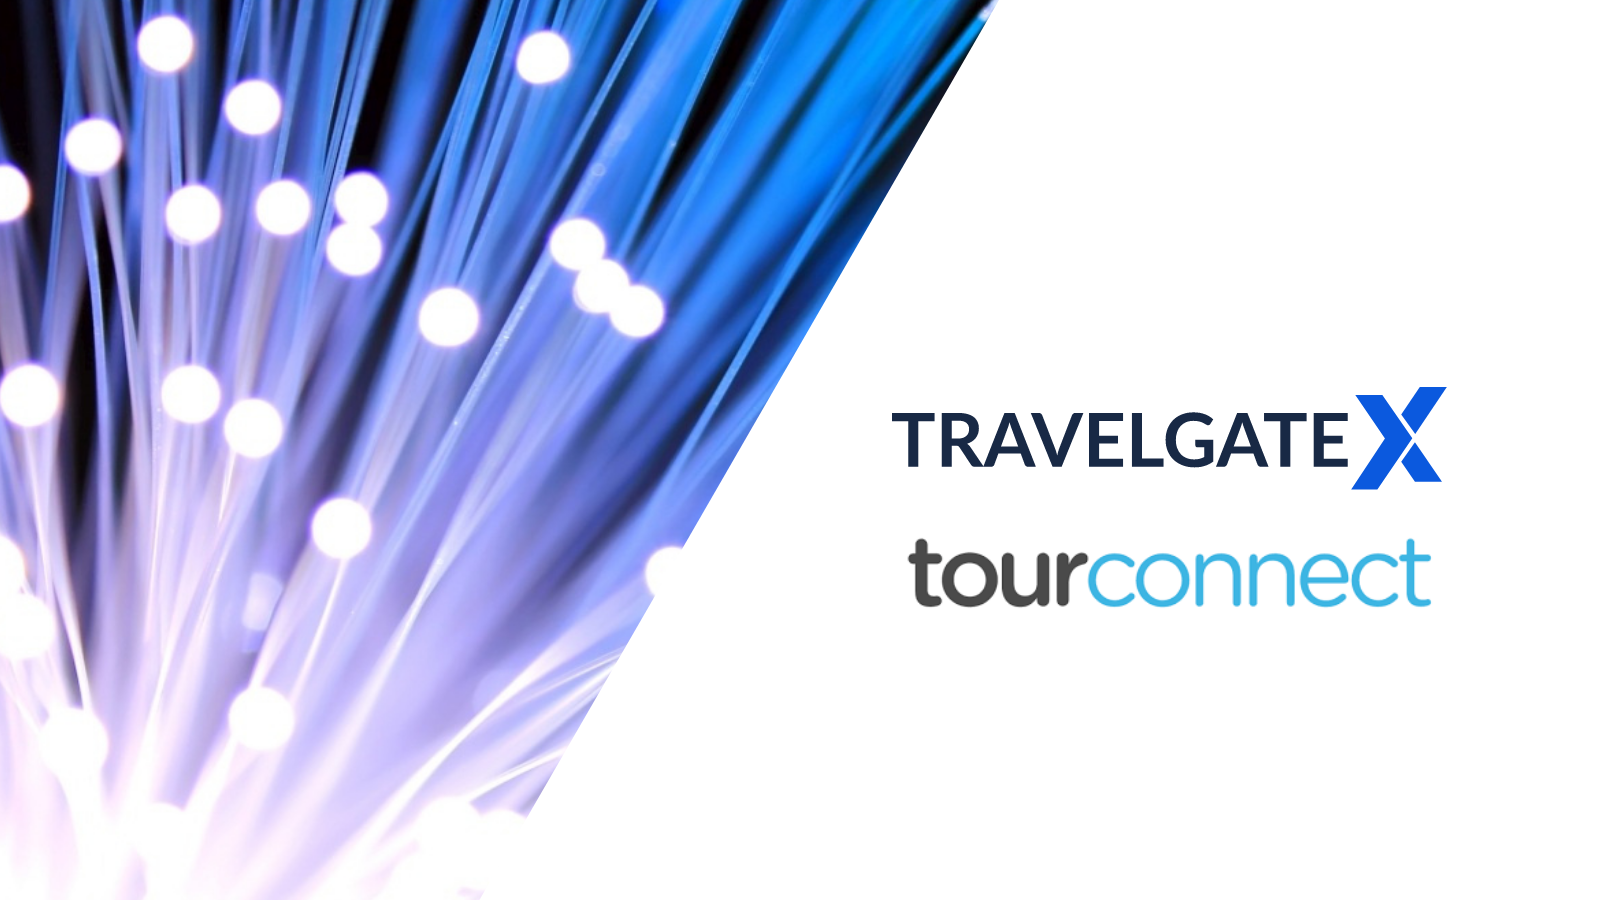 TravelgateXandTourConnect